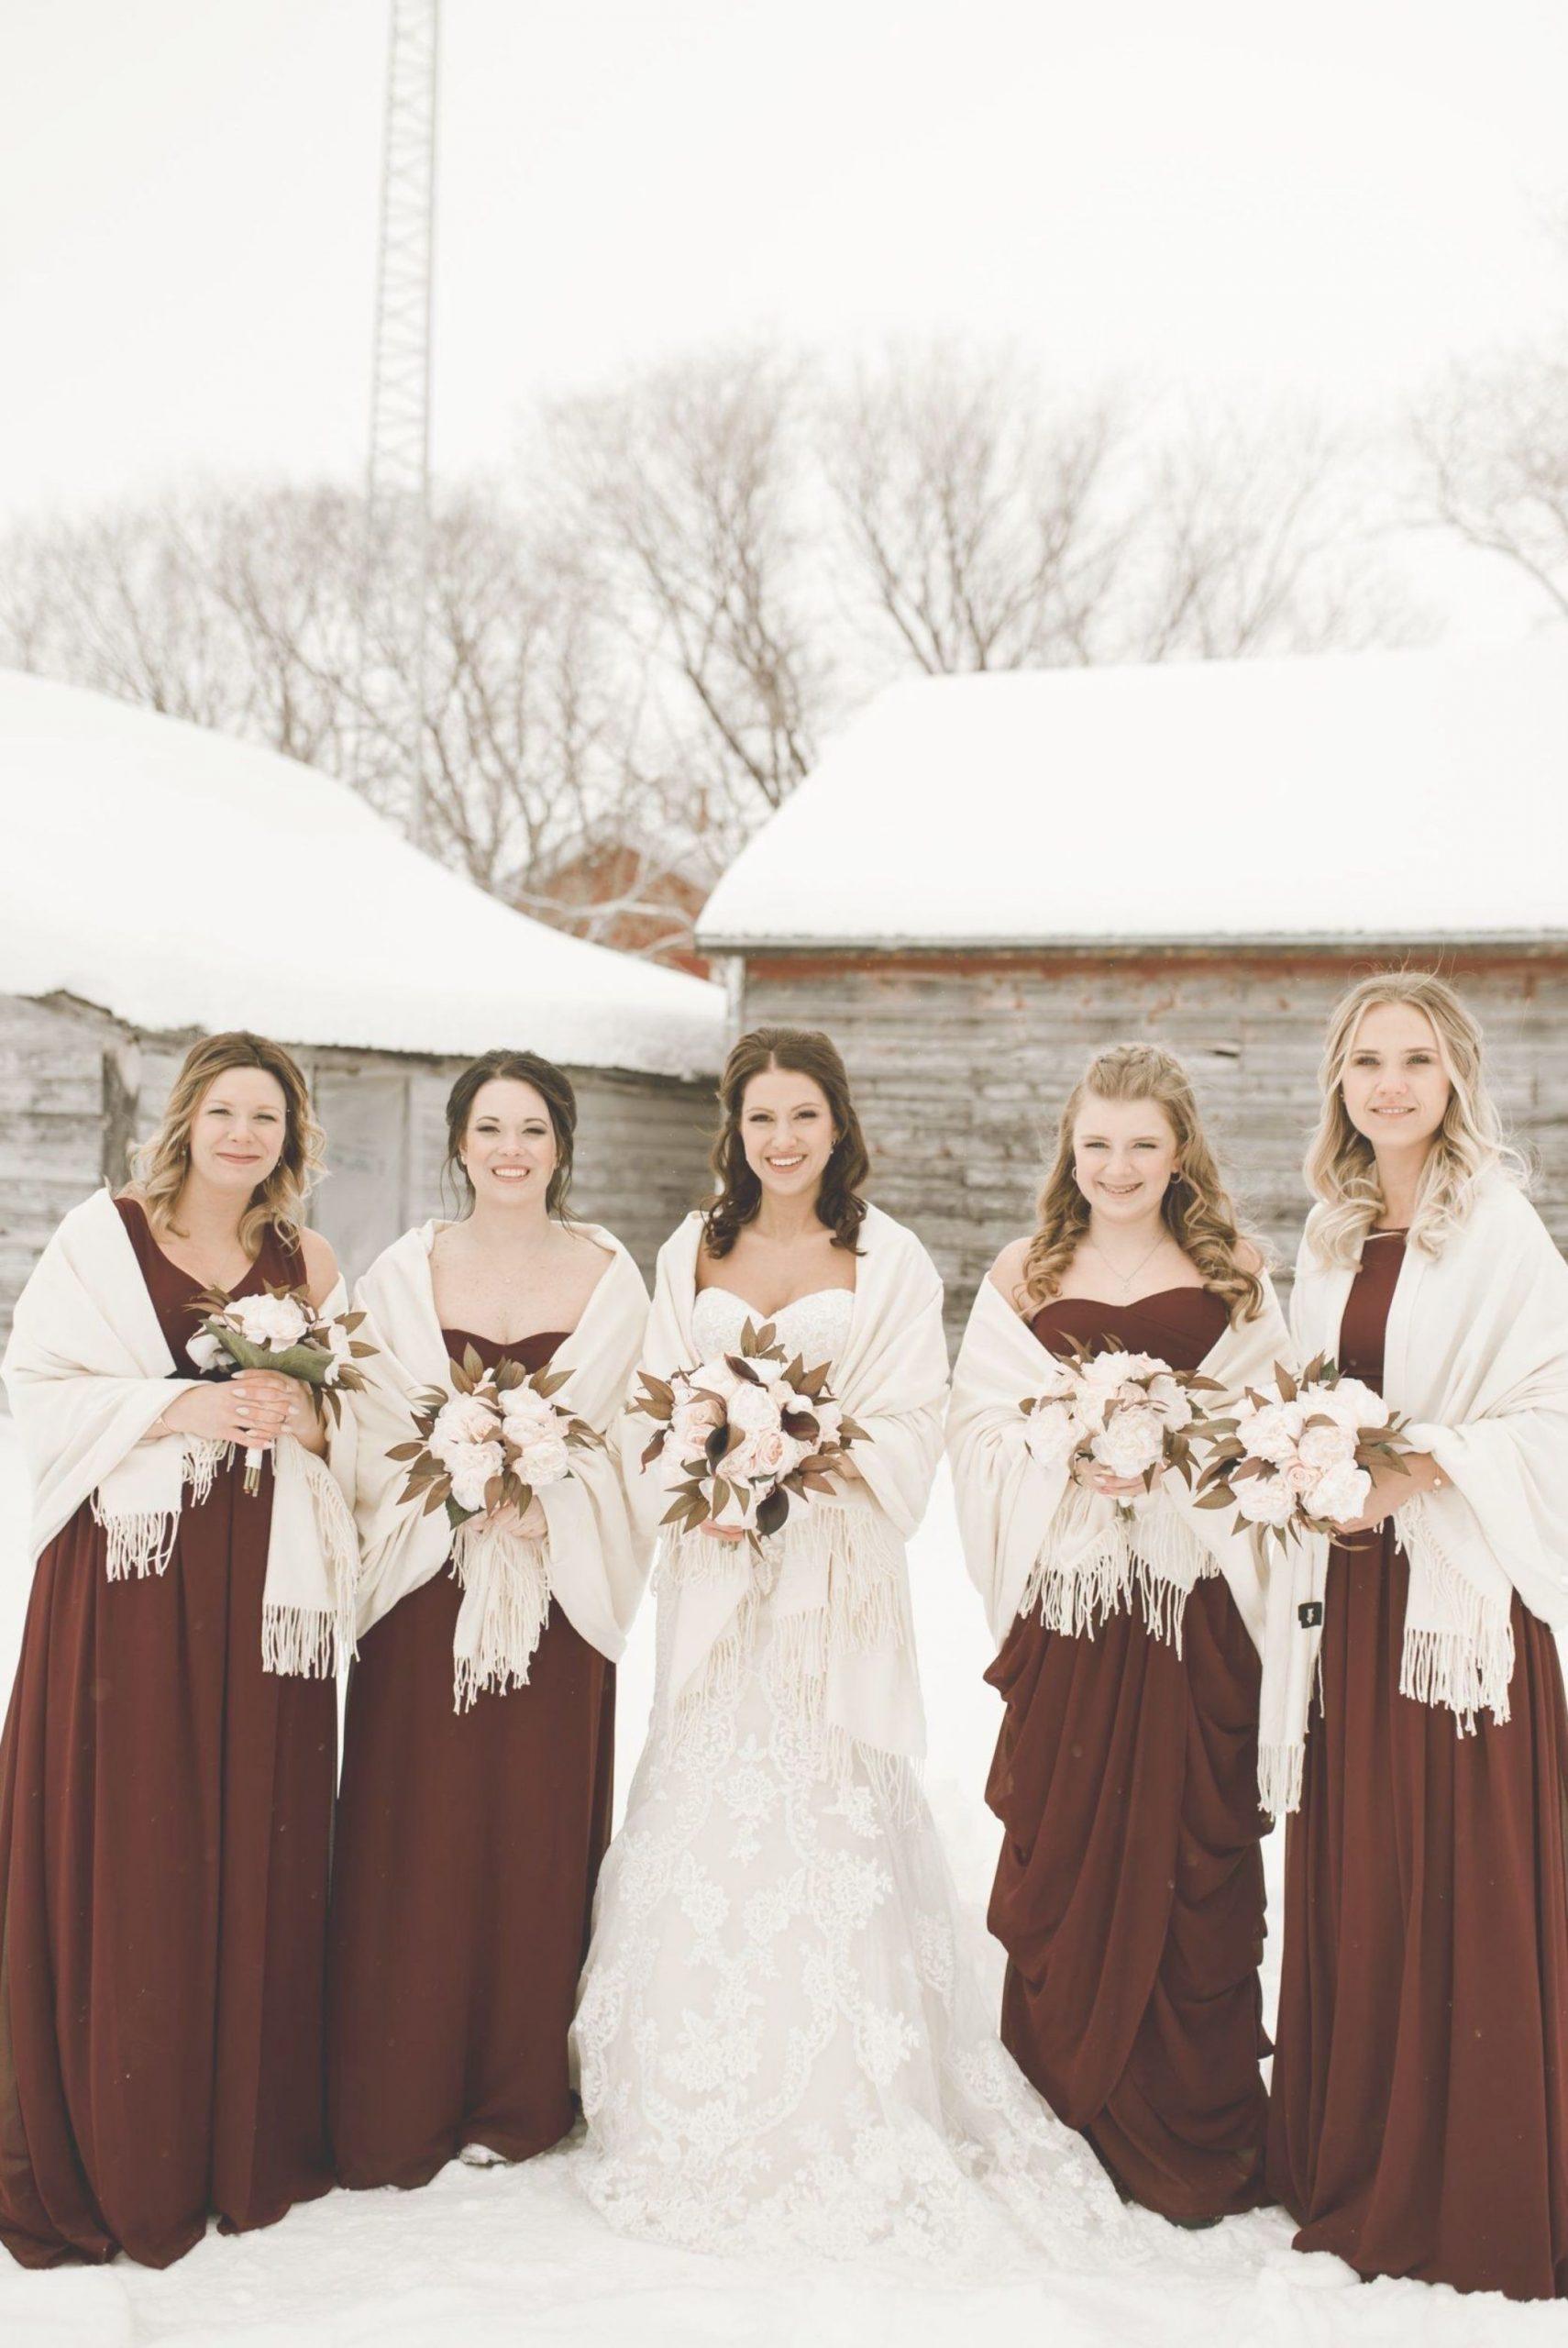 Vanessa Renae Photography, Winter Wedding Inspo, Burgundy